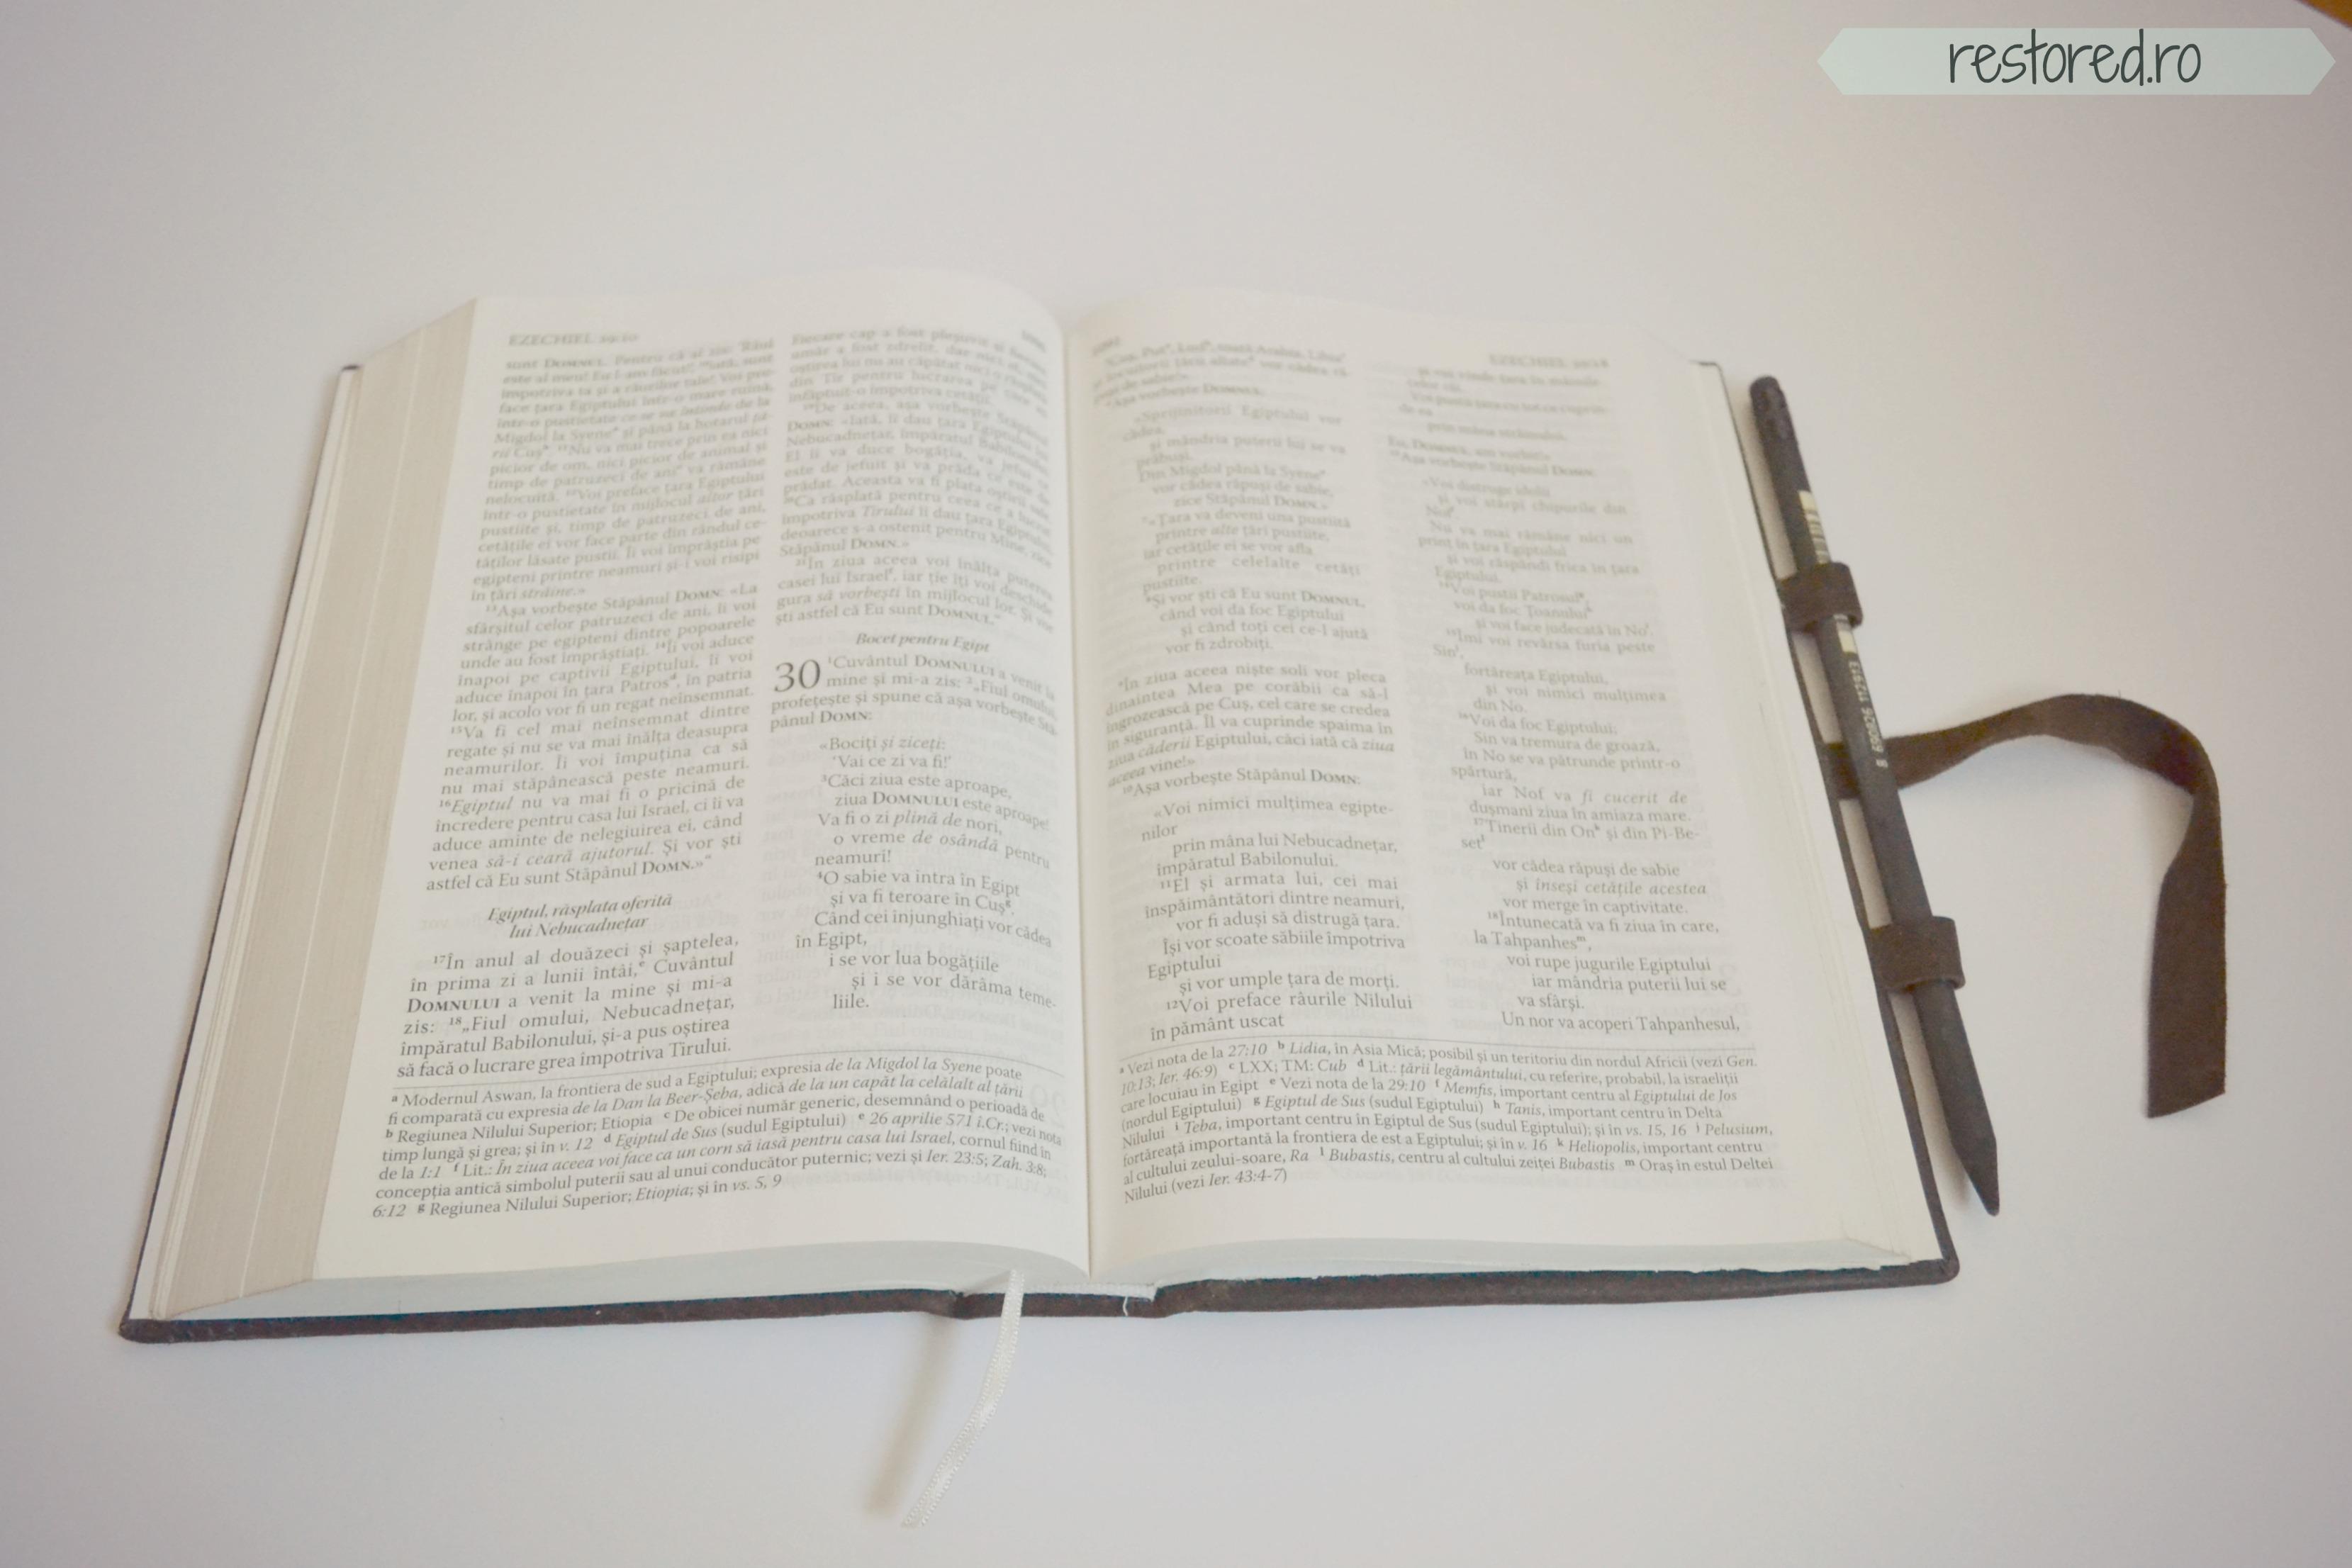 biblie-piele-maro-sistem-inchidere3